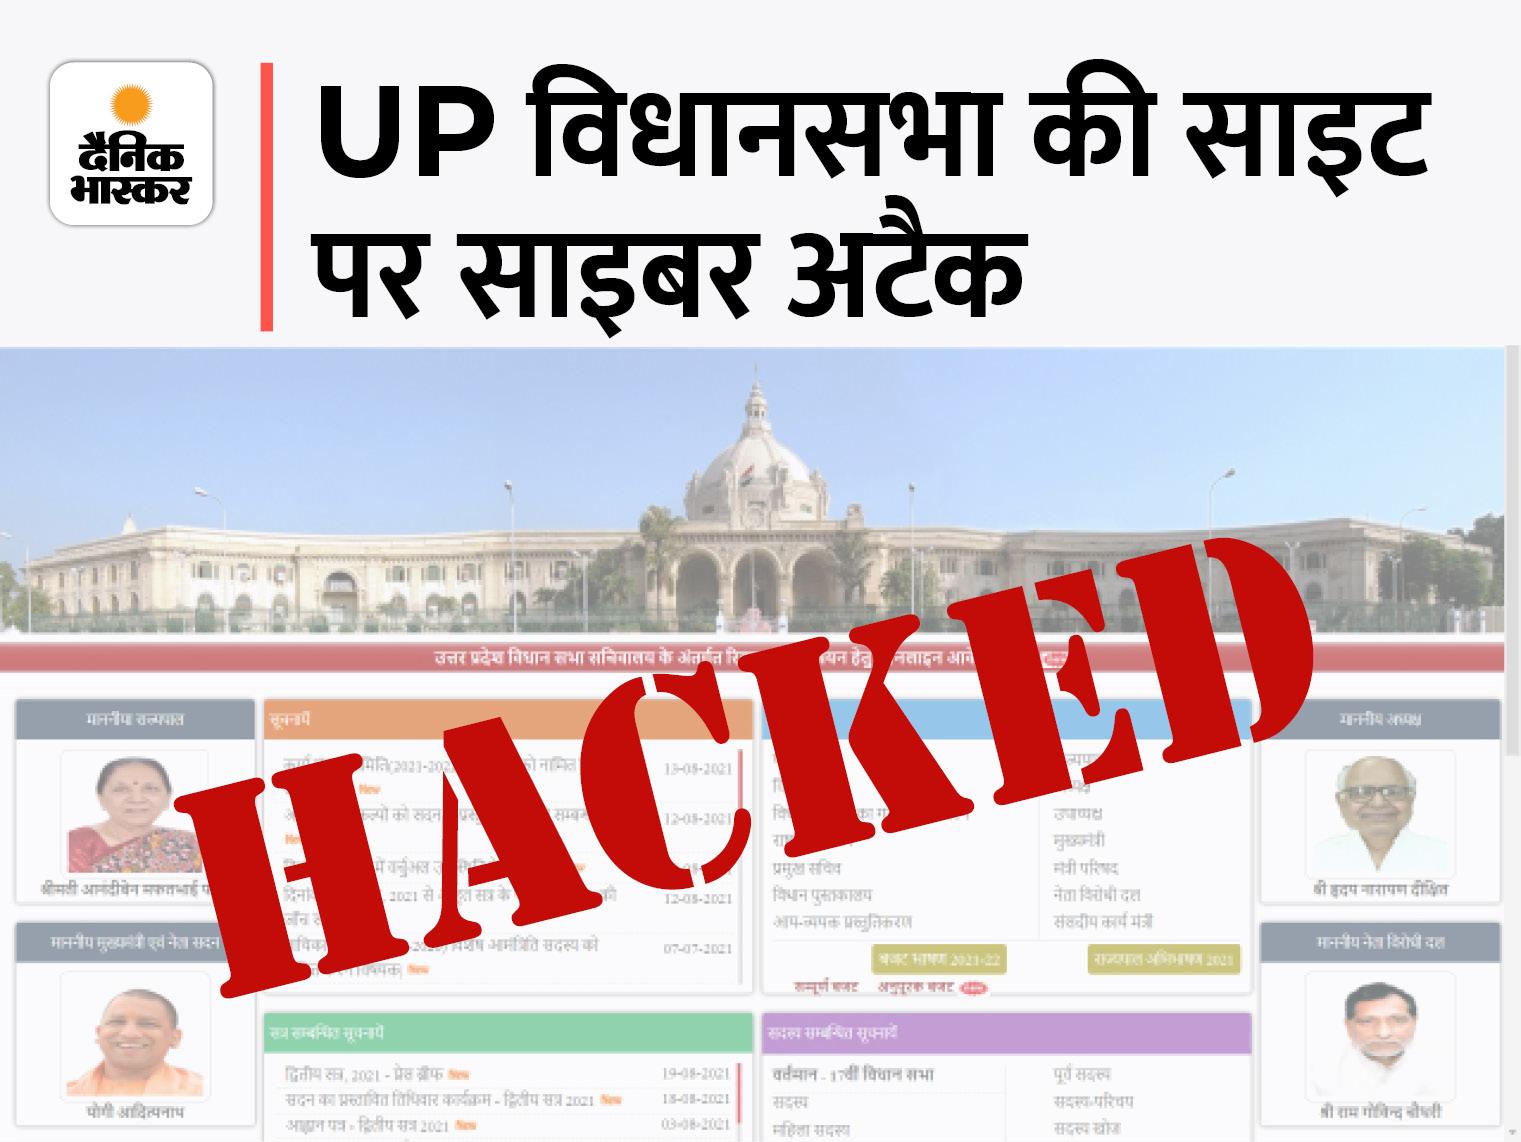 18 घंटे से ठप पड़ी, हैकर्स ने लिखी आपत्तिजनक बात, संभालने वाली संस्था यूपी डेस्को ने दर्ज कराया केस लखनऊ,Lucknow - Dainik Bhaskar